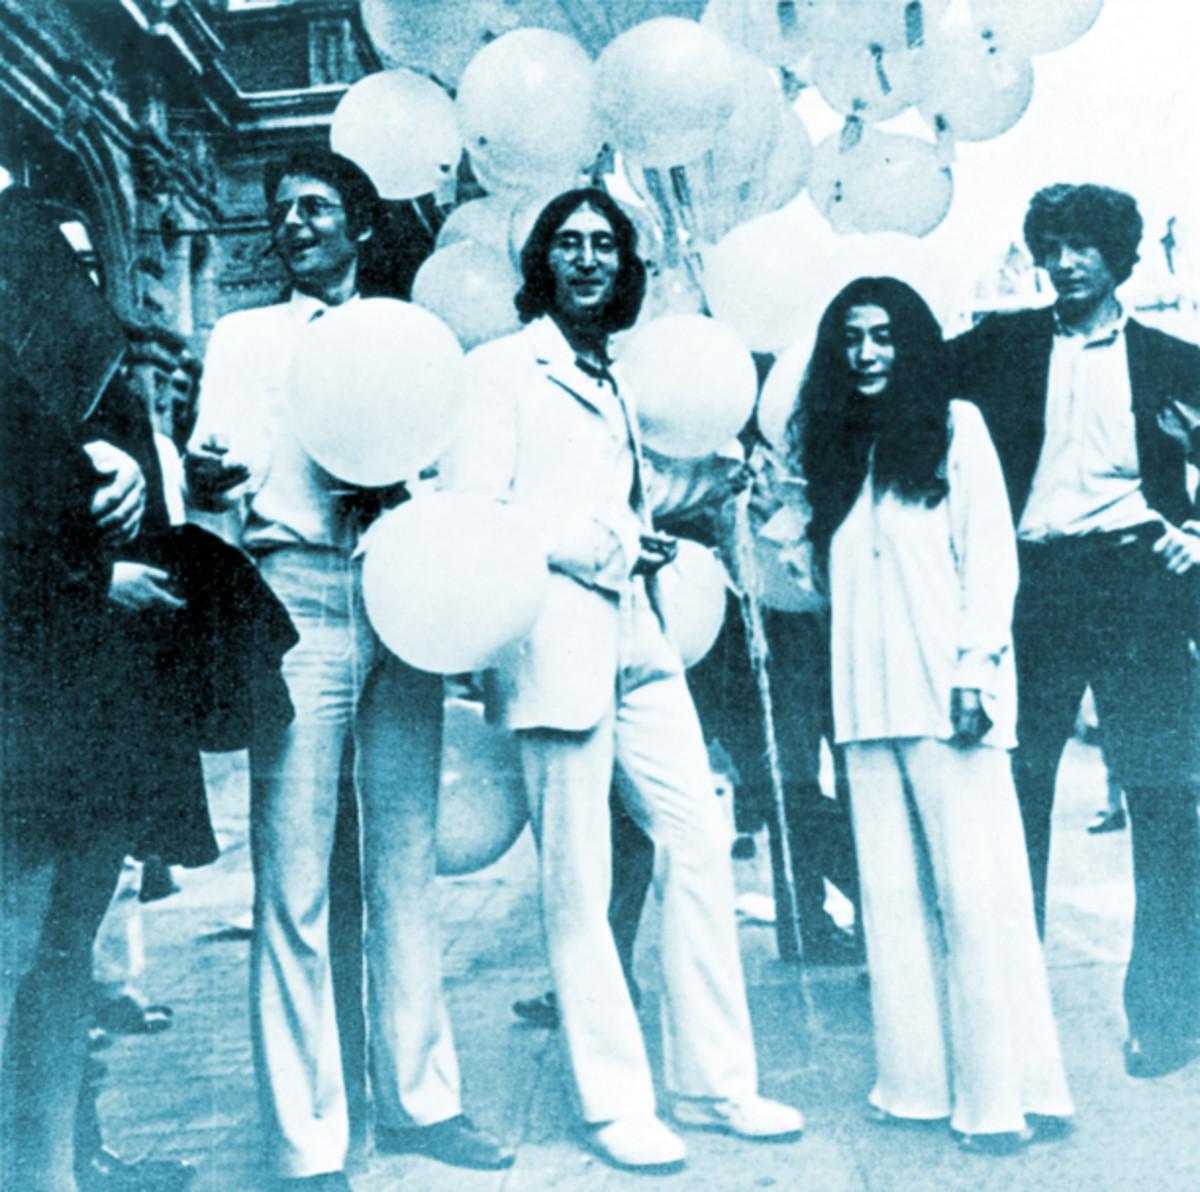 Plastic Ono Band publicity photo